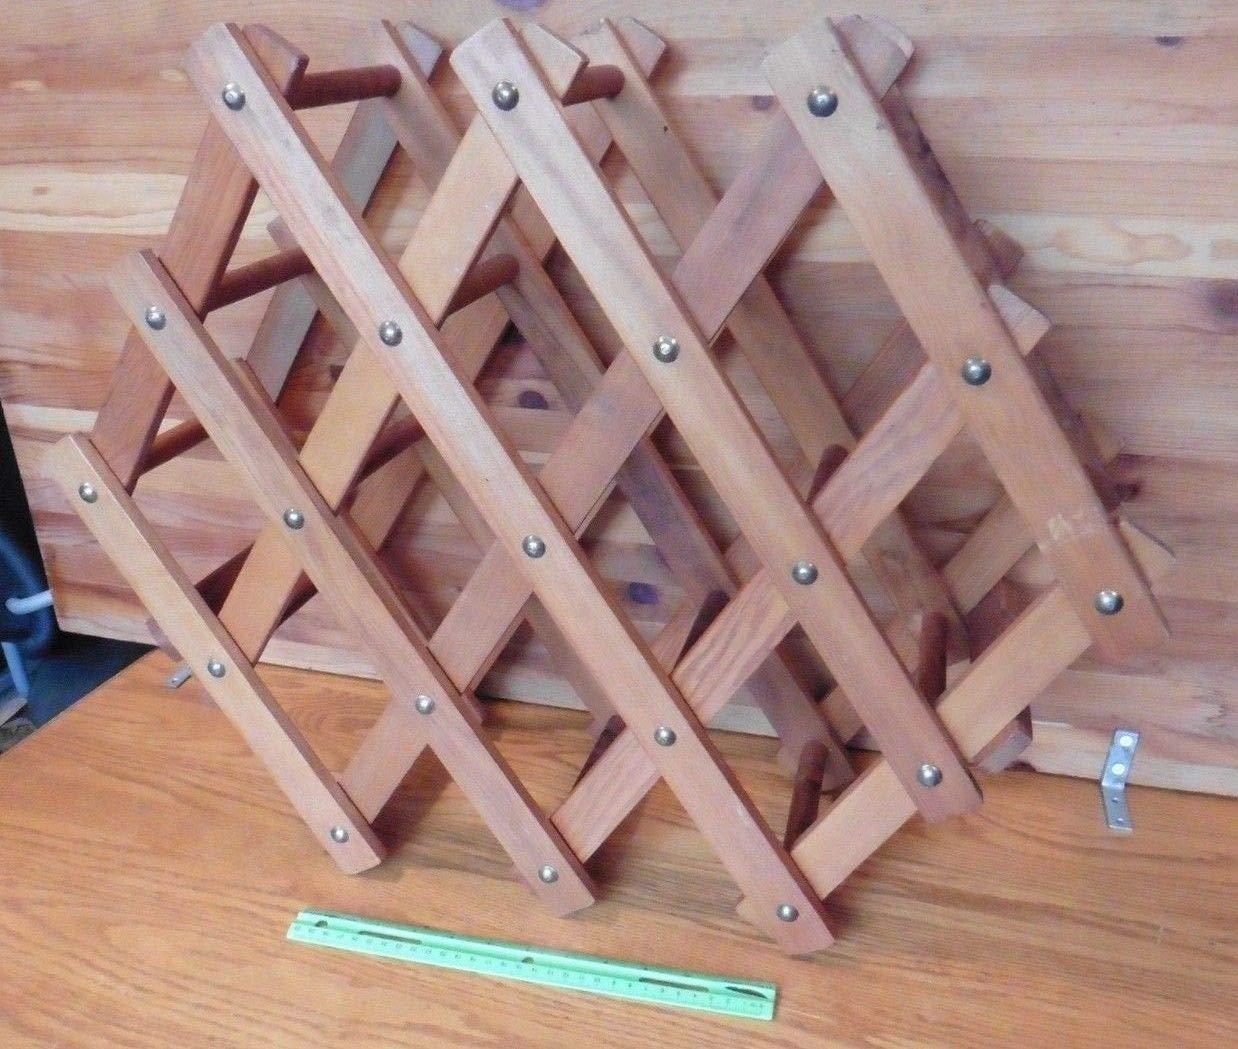 Astonishing Amazon Com Wine Rack Wooden Bottle Holder Collapsible Theyellowbook Wood Chair Design Ideas Theyellowbookinfo